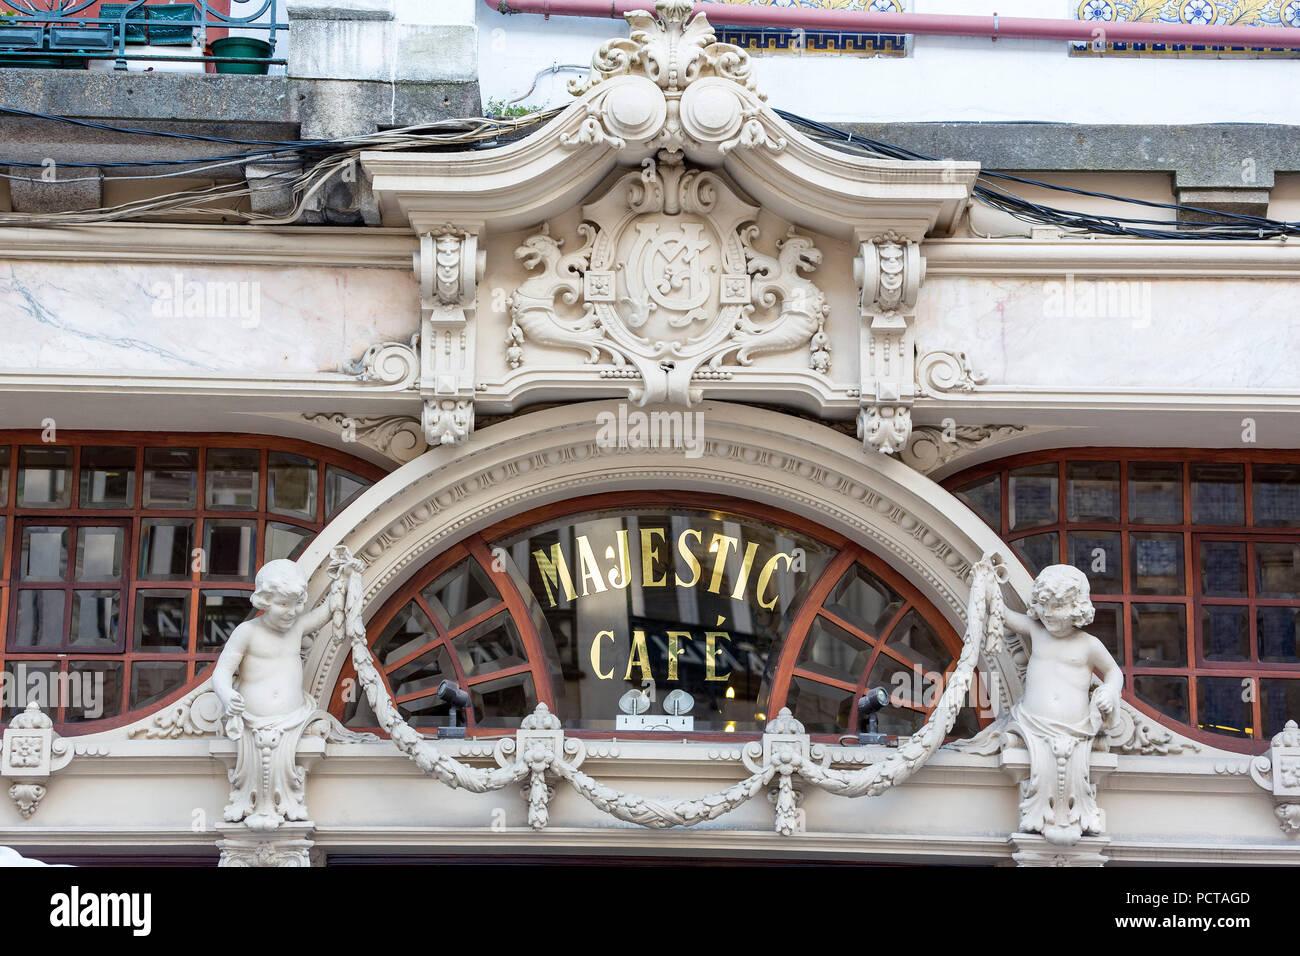 Café Majestic, art nouveau cafe, Taverne, restaurant, Oporto, Distrikt Porto, Portugal, Europa Stock Photo